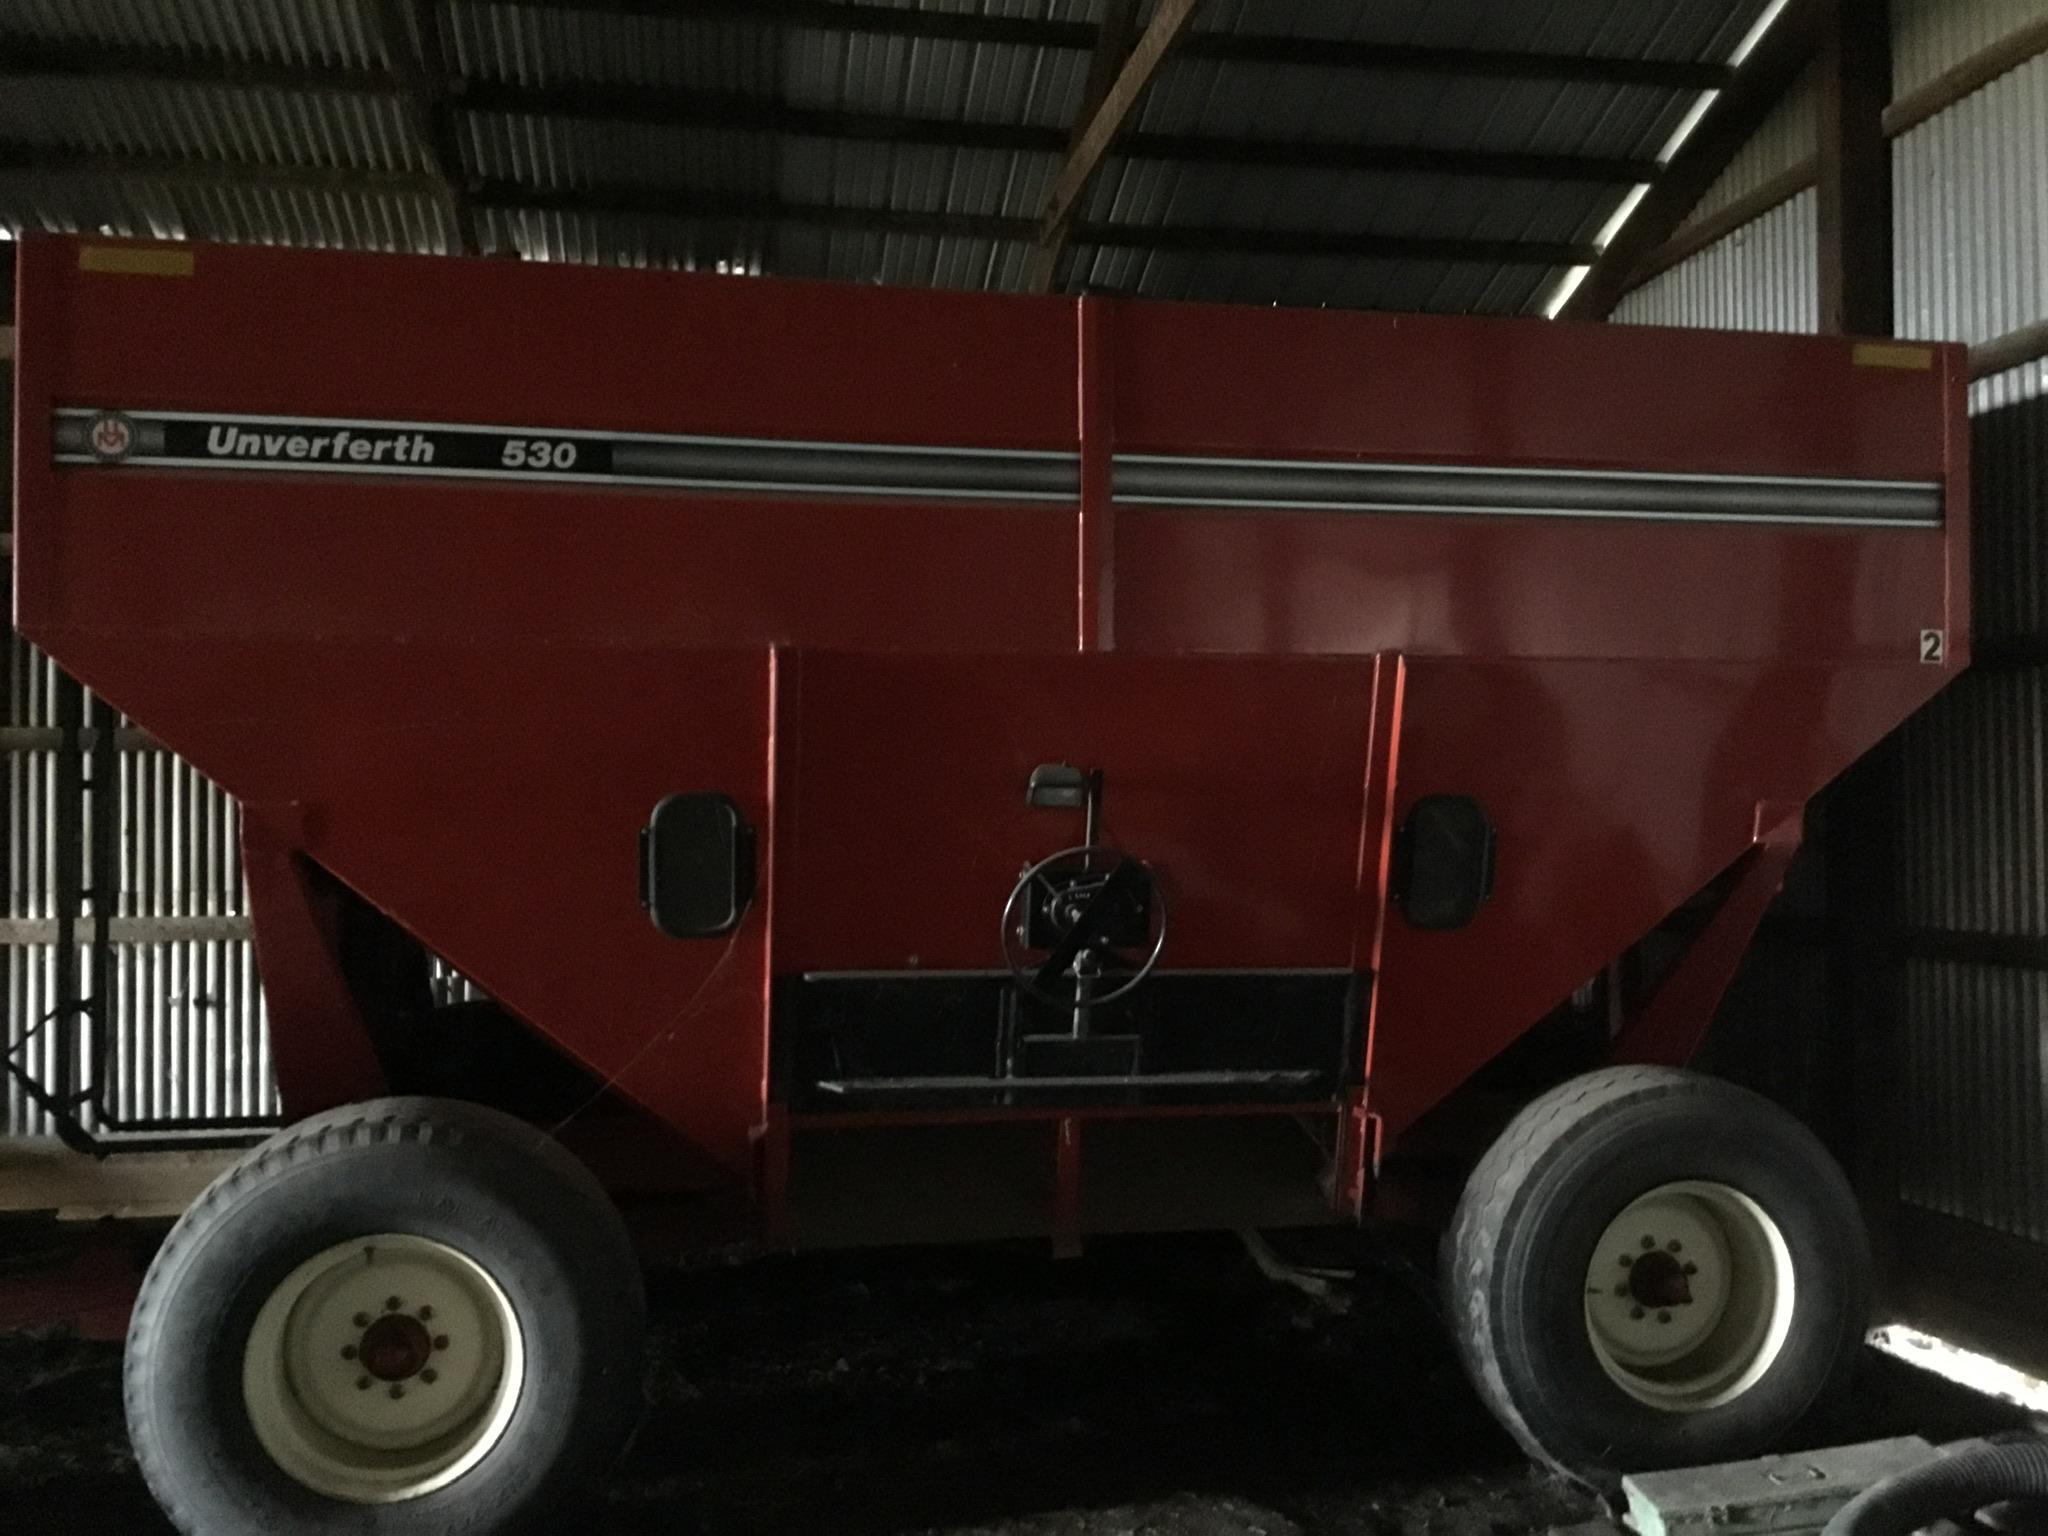 Unverferth 530 Side Dump Wagon, Brakes, 425-65R-22.5 Tires, Serial #B206-50-119, Red, Sharp